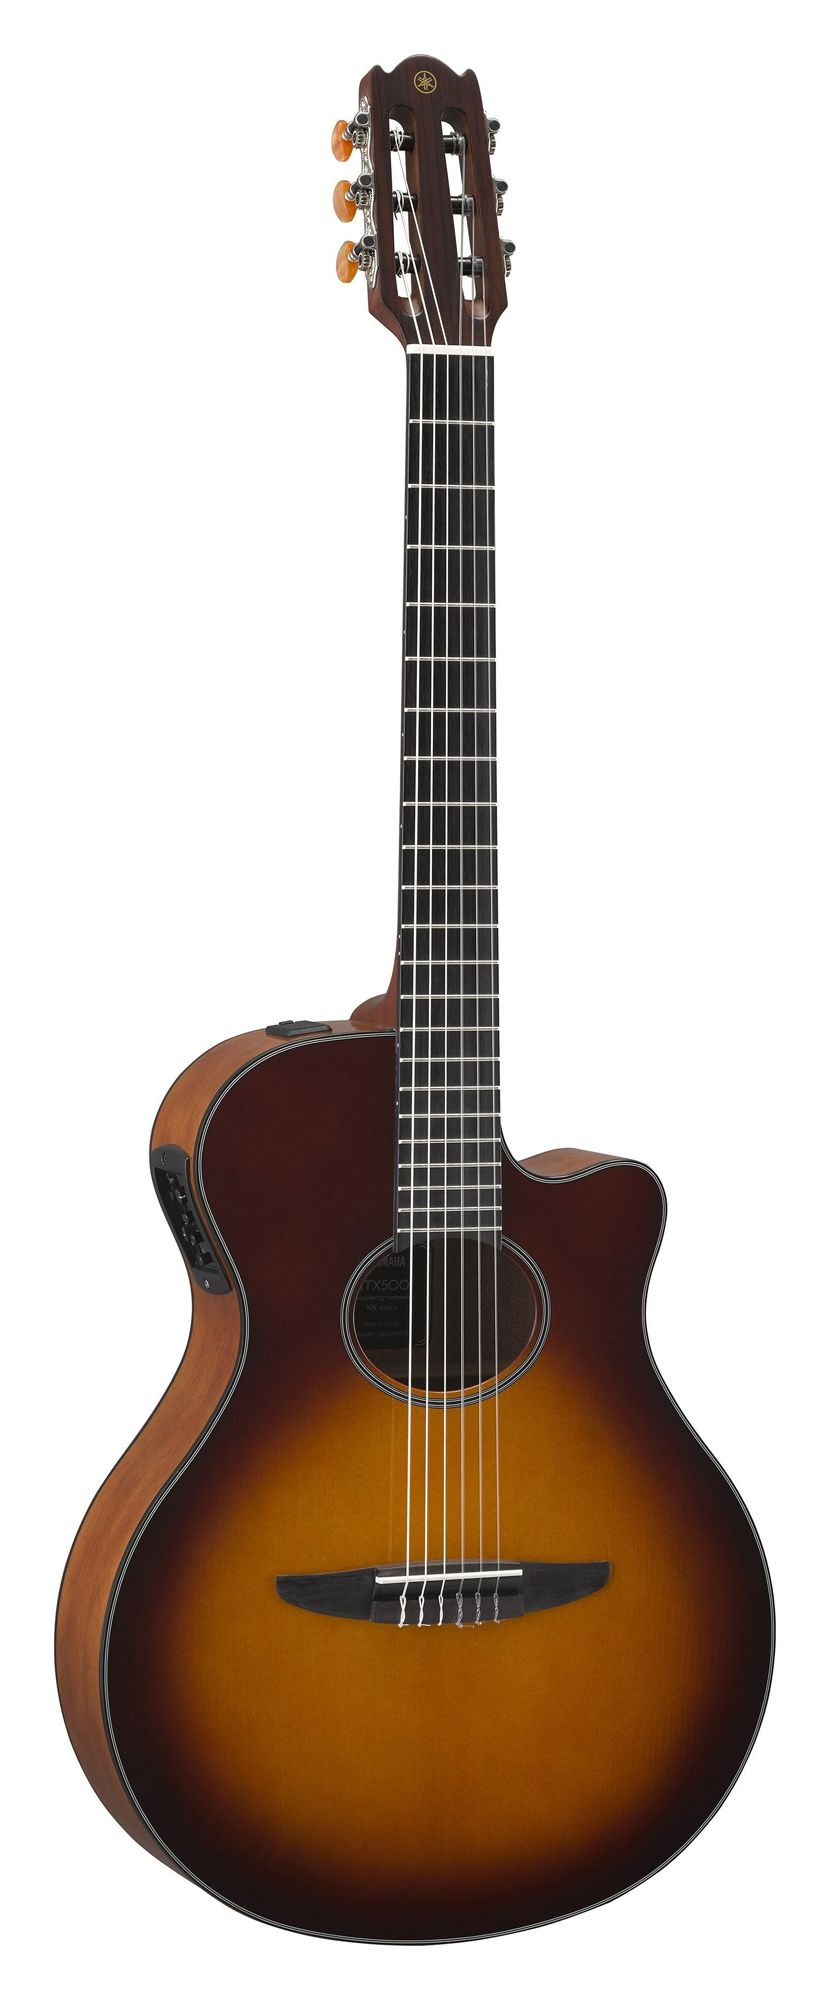 Violão Yamaha NTX500 - Brown Sunburst